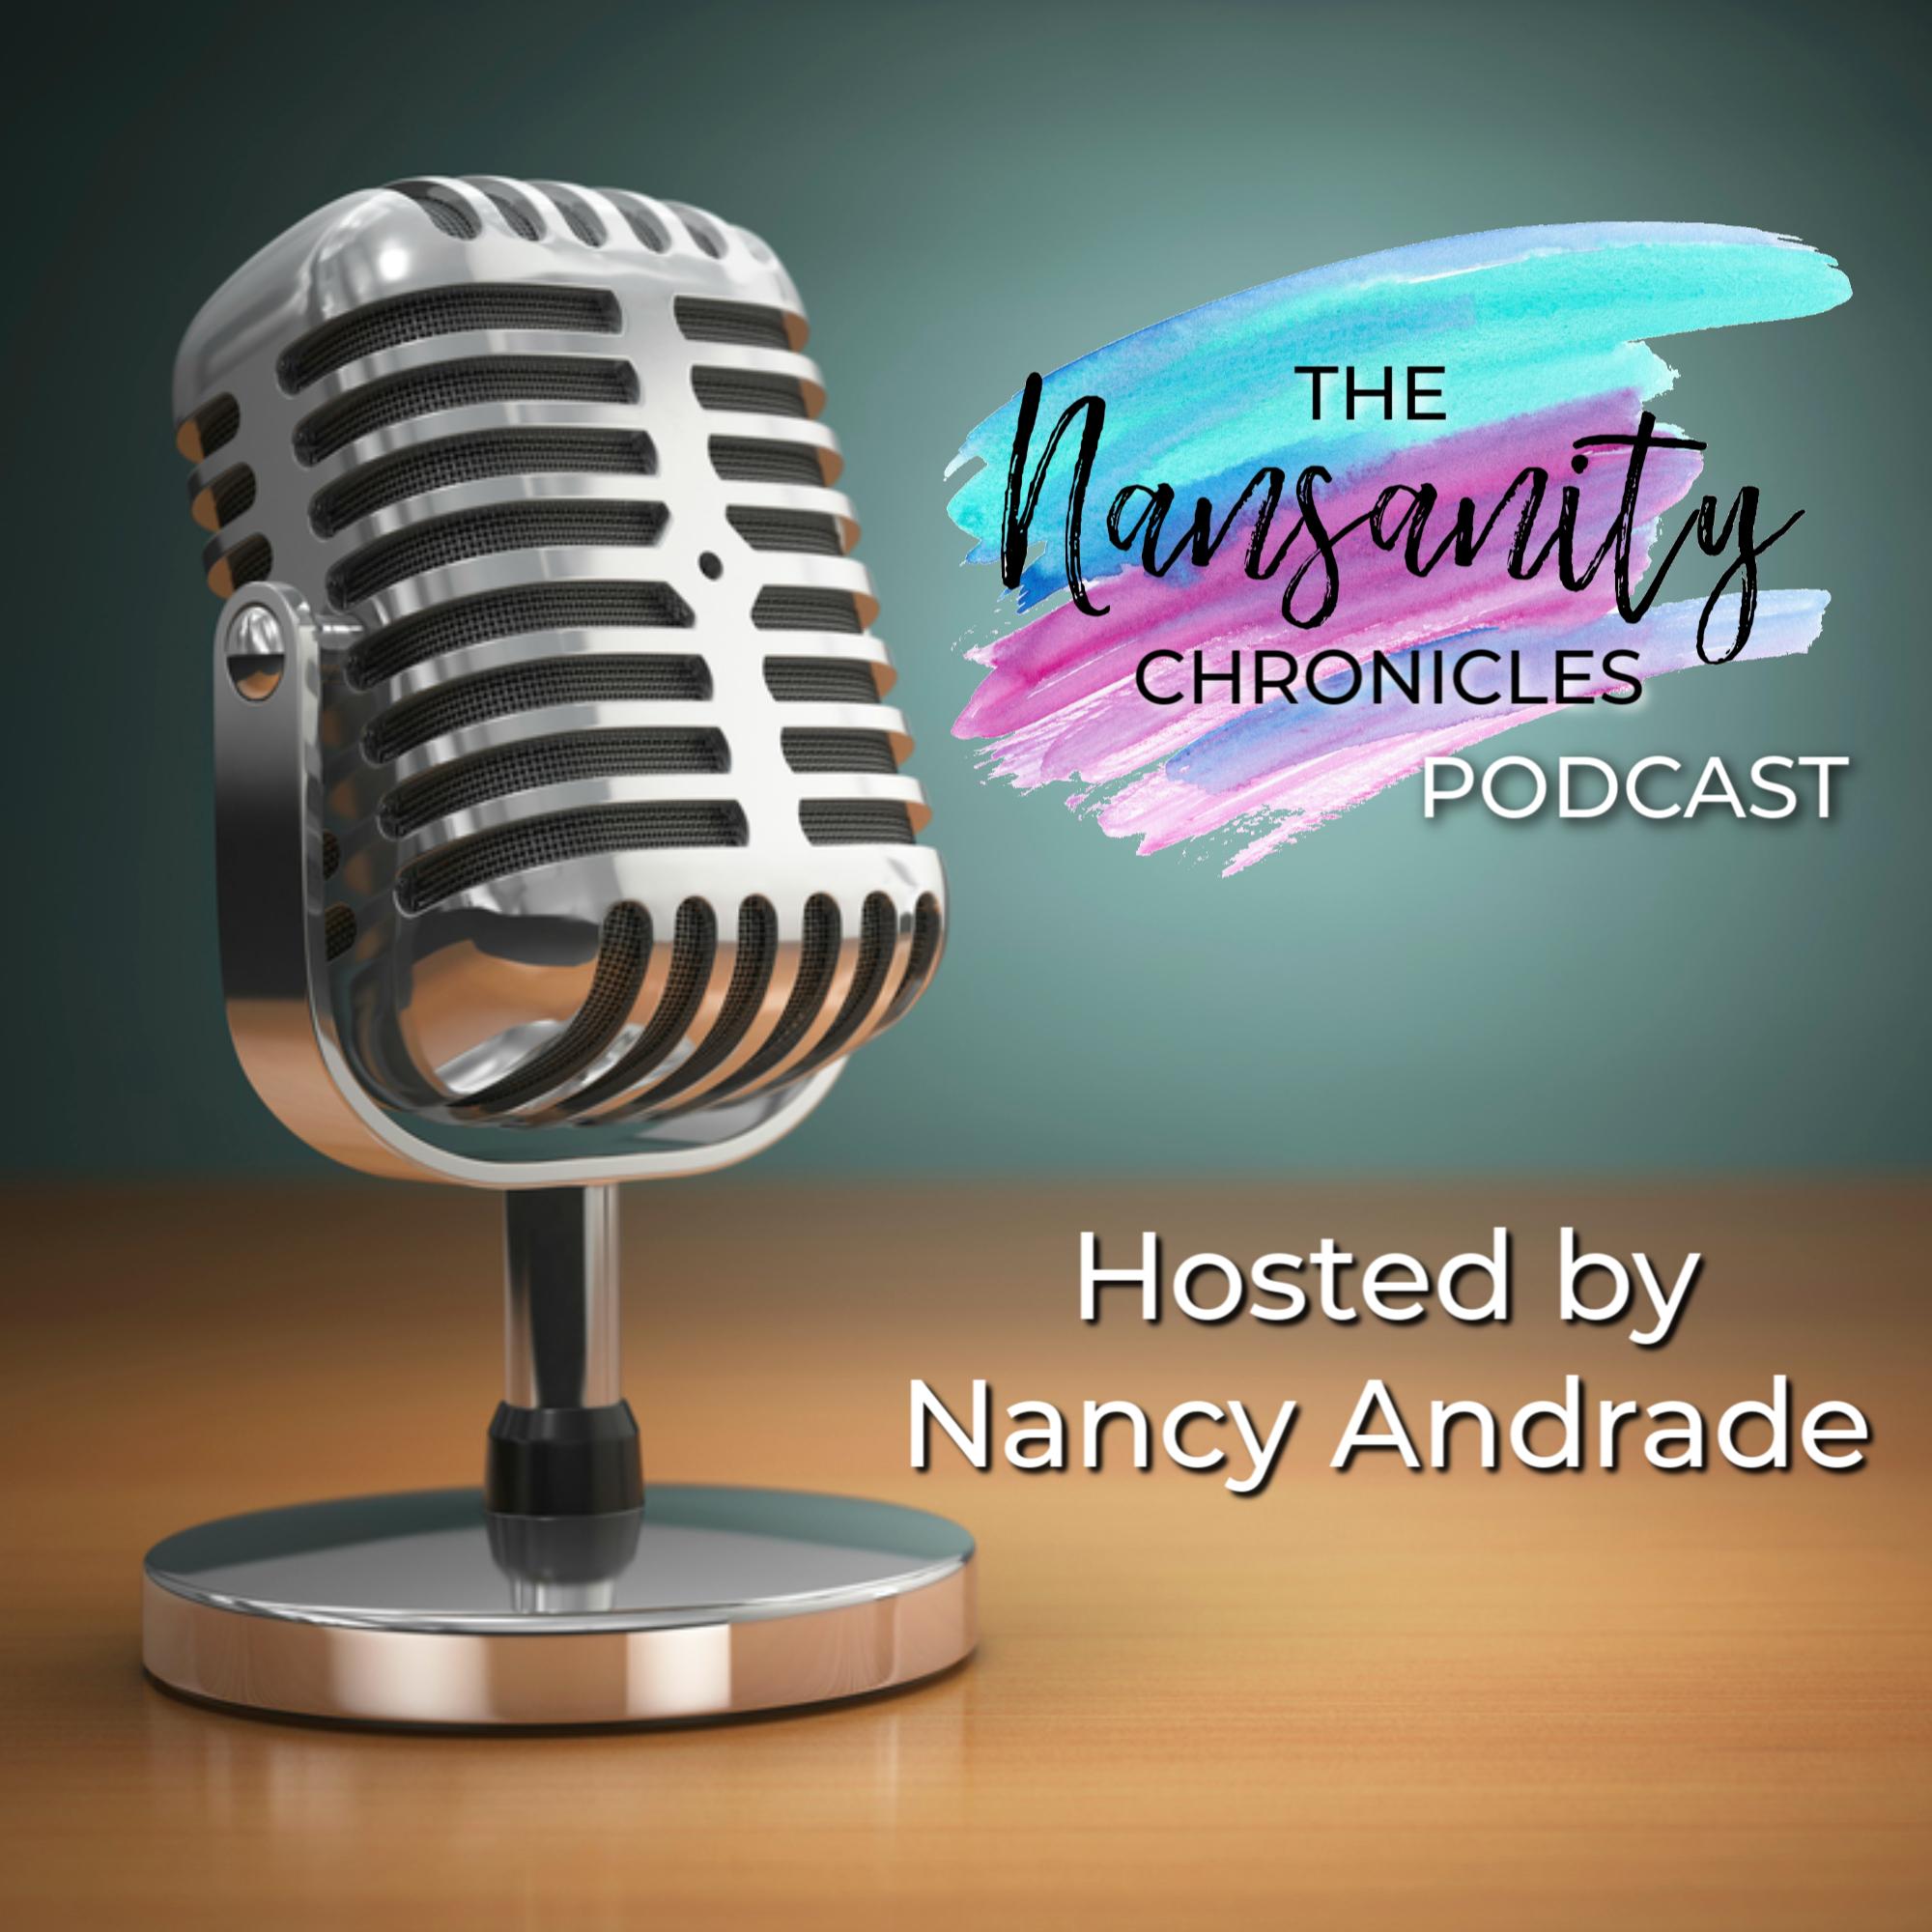 The Nansanity Chronicles show art